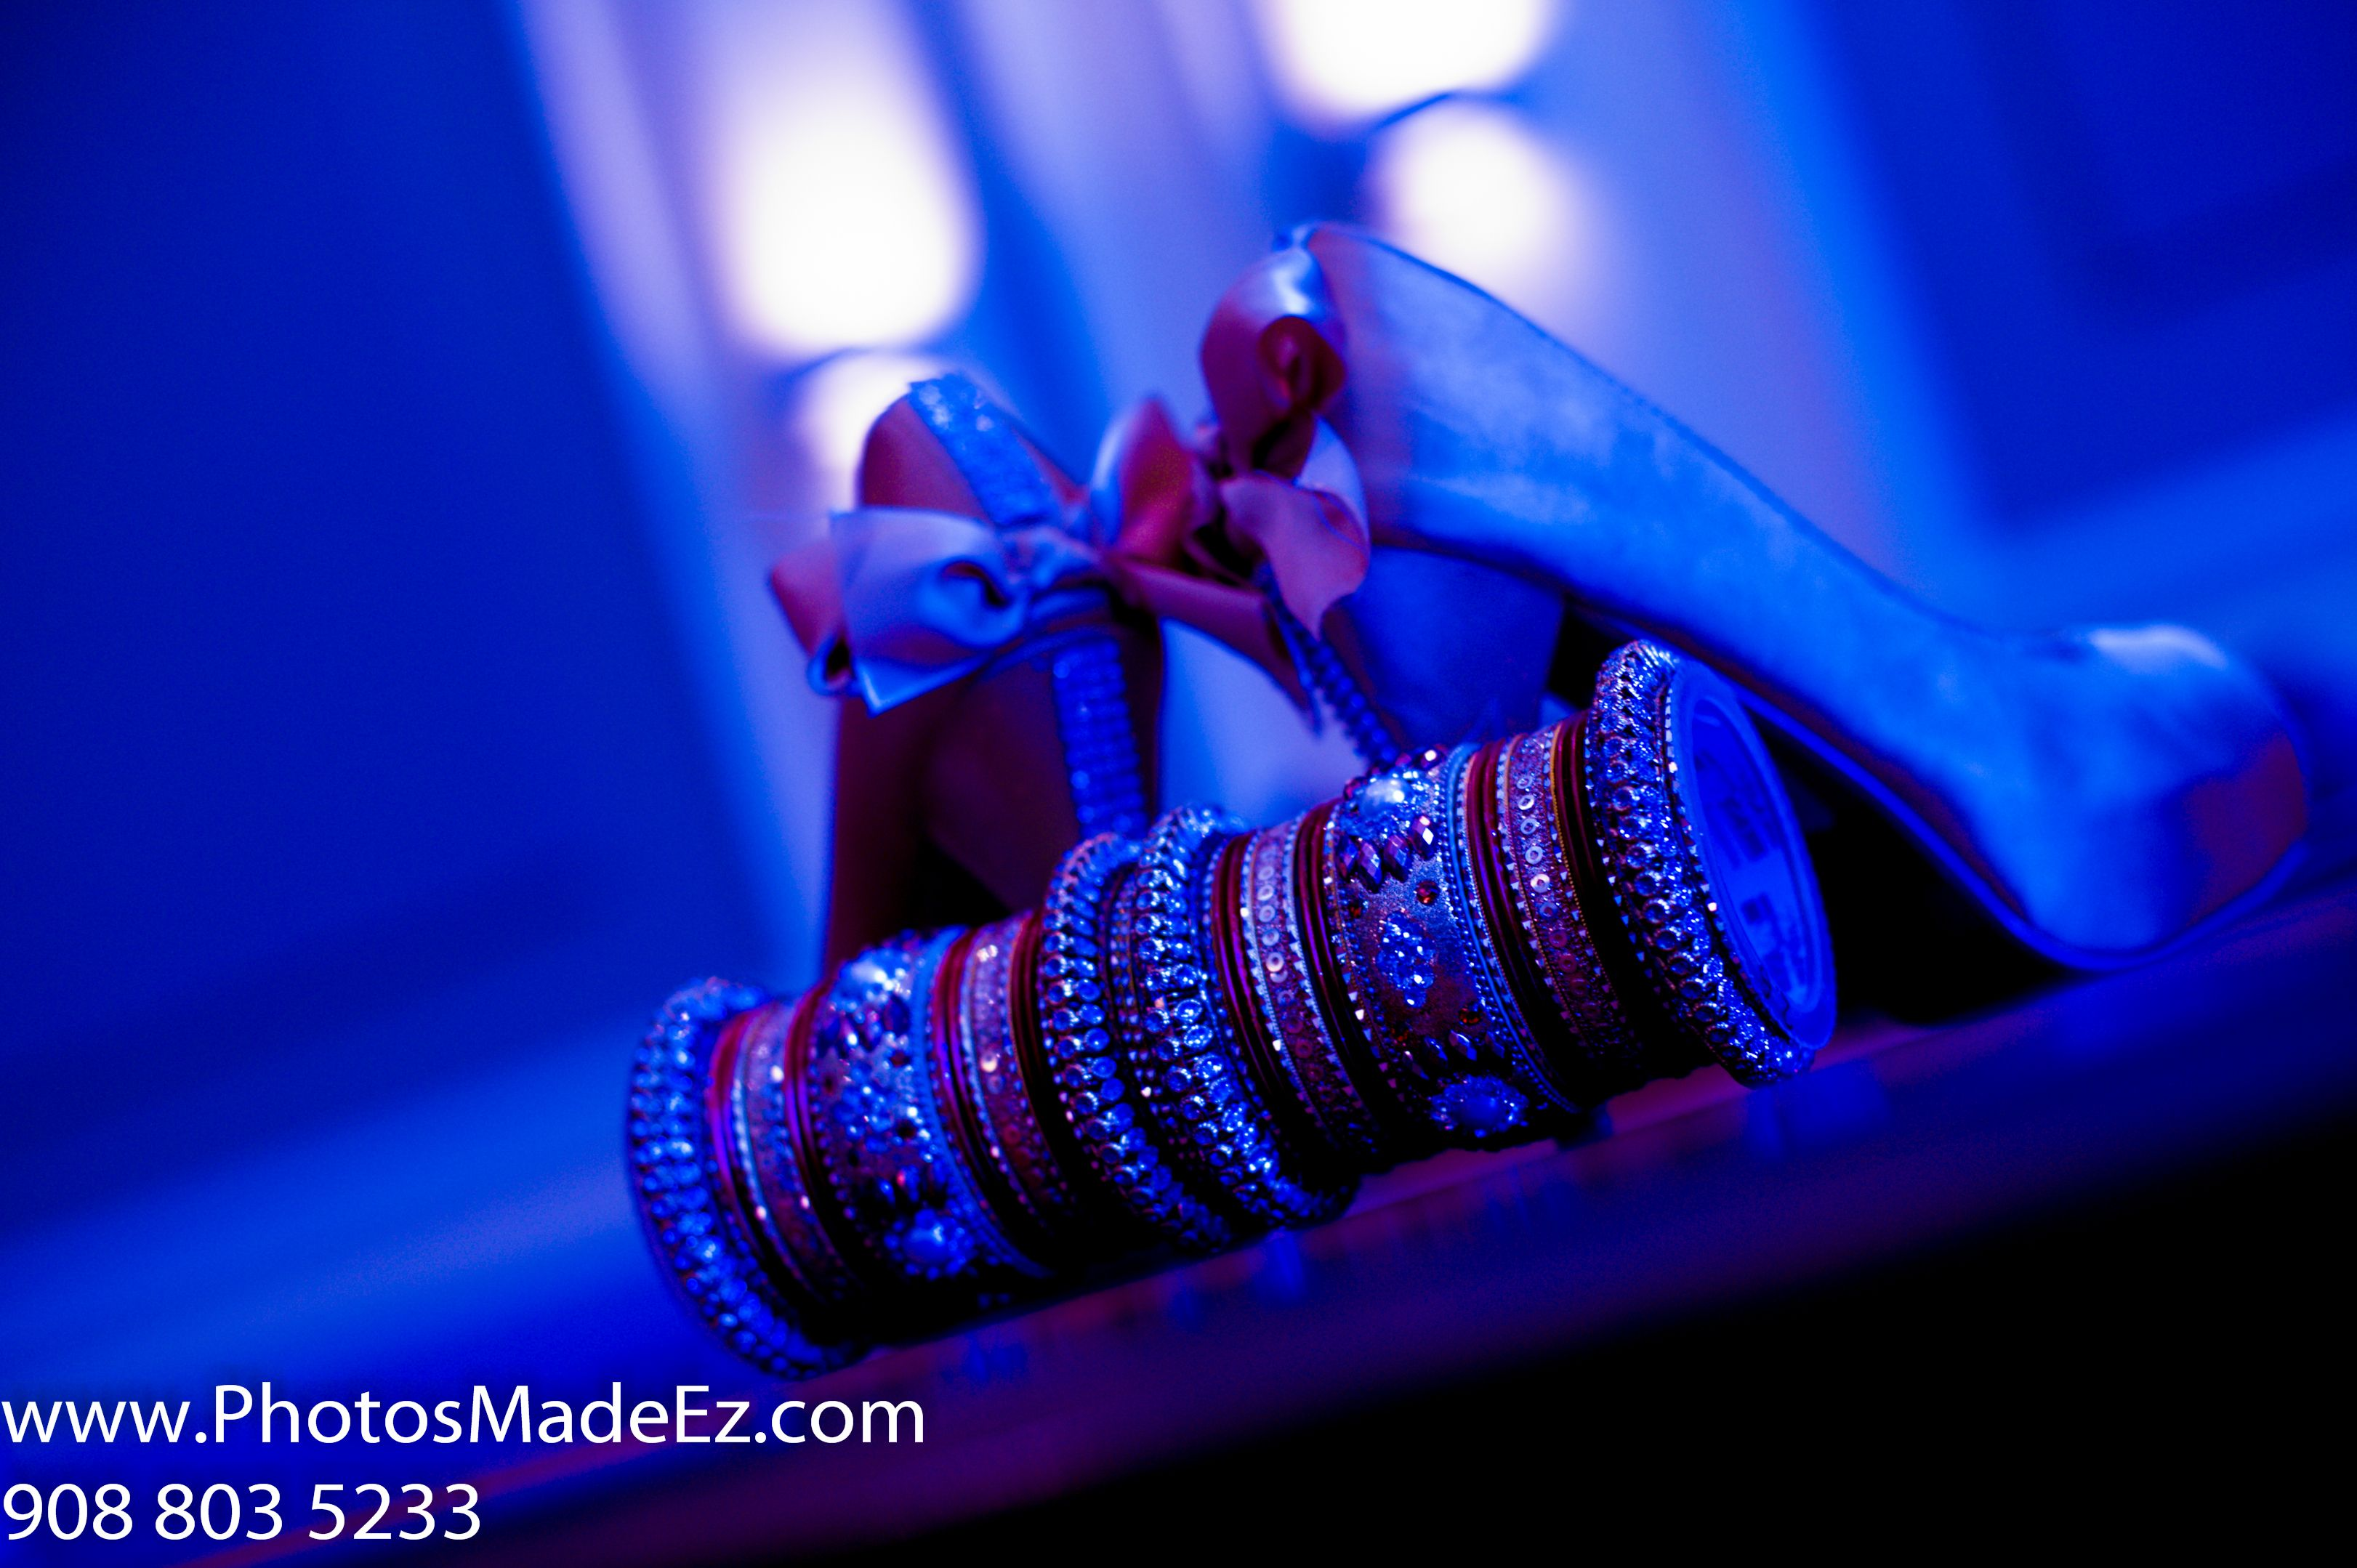 Bride s Shoes accessories ring boquet chura clutch necklace